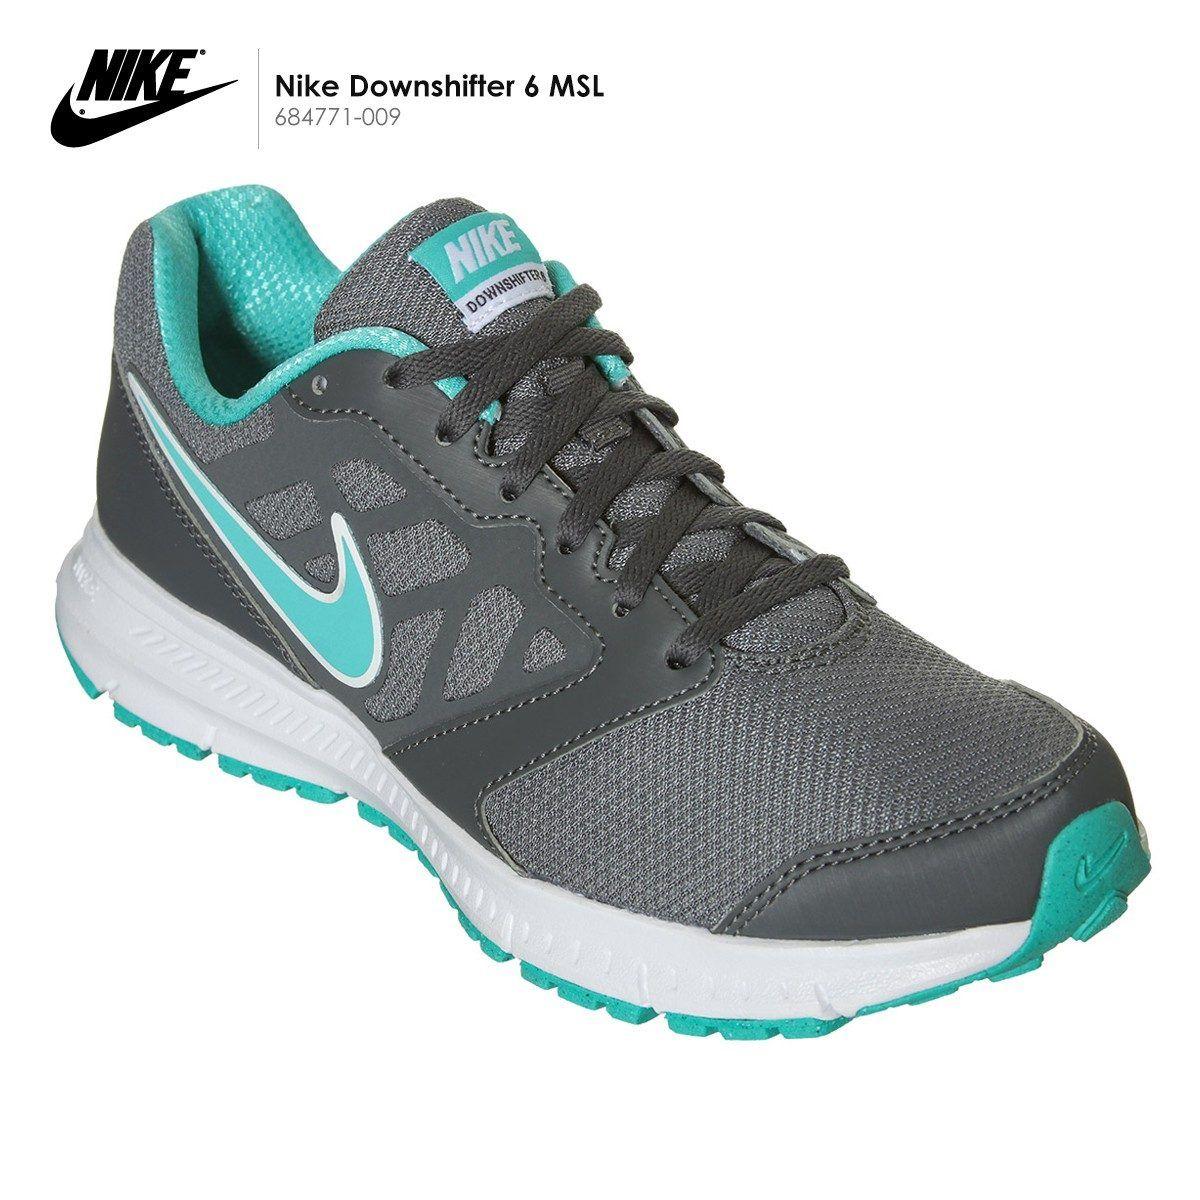 Zapatos grises Nike Downshifter para mujer ZBABb9SJ